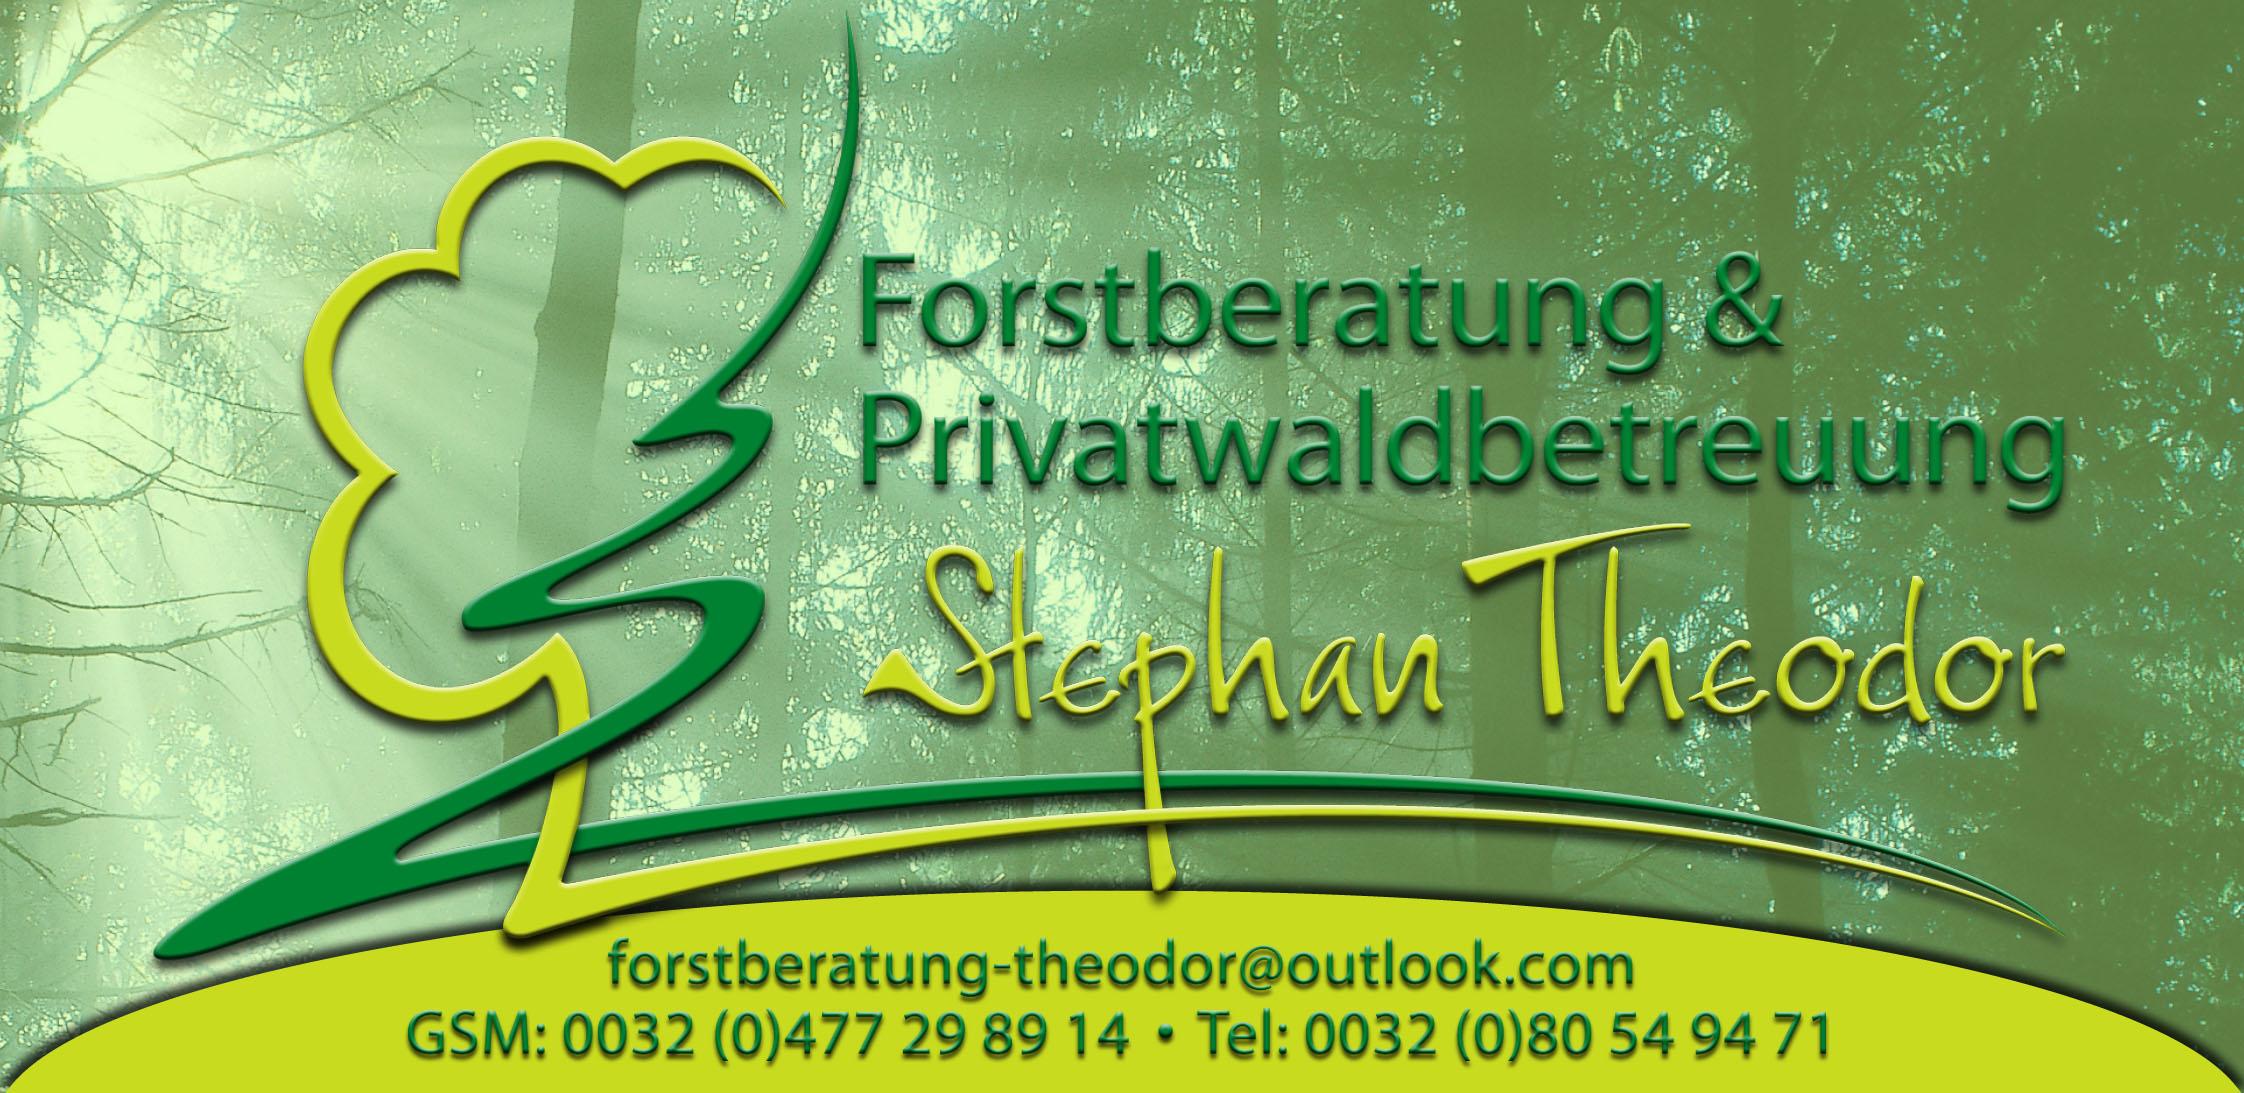 Logo Forstberatung & Privatwaldbetreuung Stephan Theodor